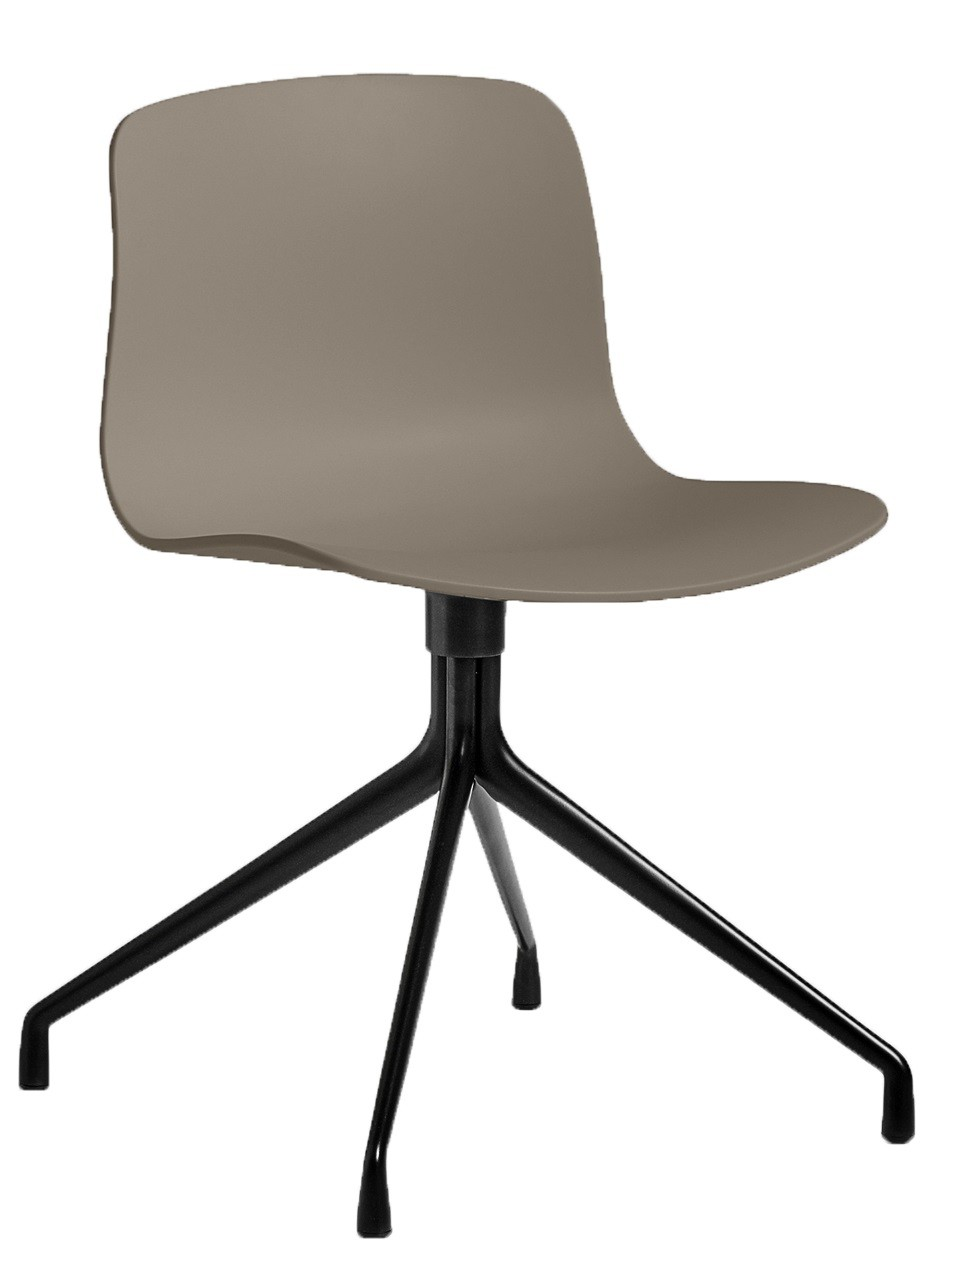 Chaise aac10 de hay pi tement en aluminium teint noir khaki for Chaise kaki